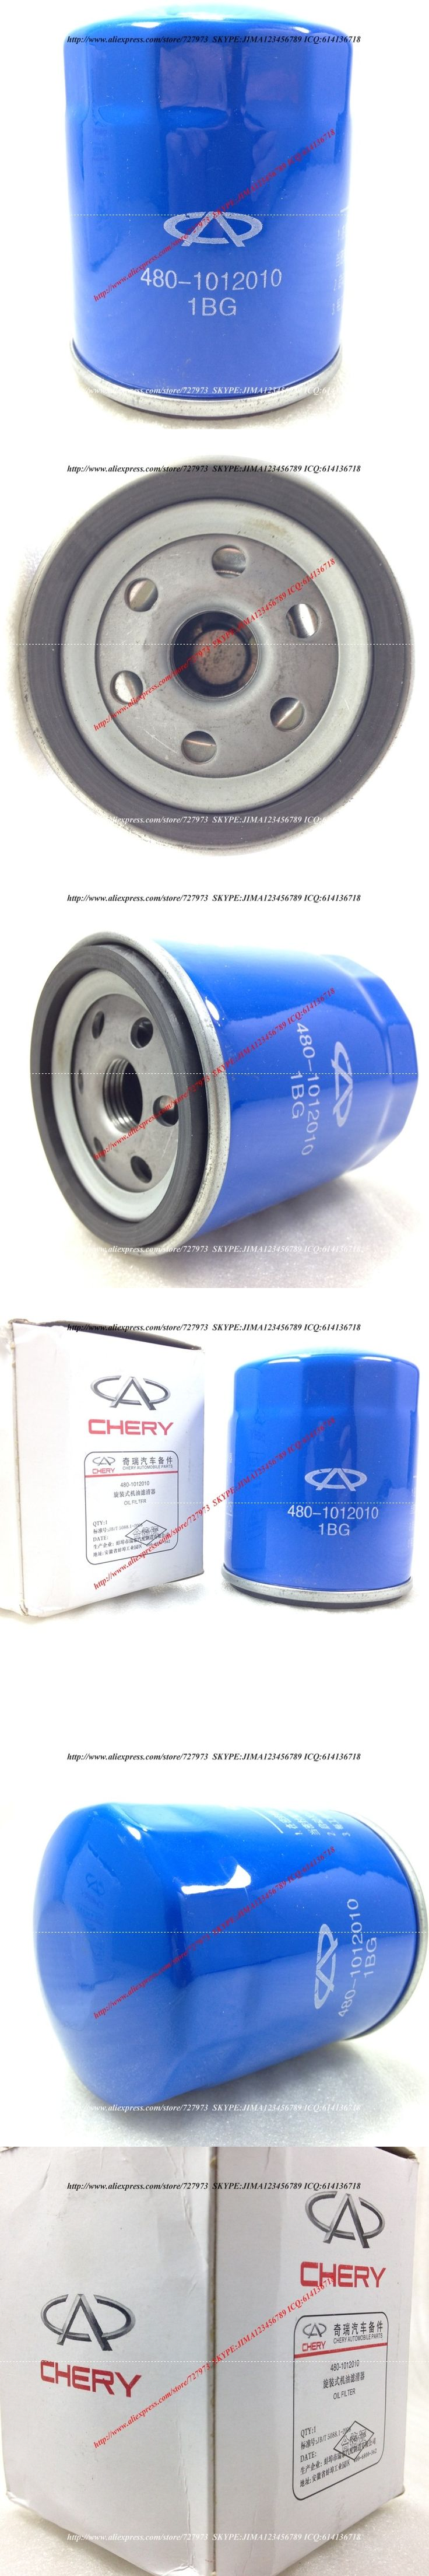 JICOSMOSLU: Oil Filter For Chery Amulet Bonus Karry Yoyo Very A15,A18,ENGINE SQR477,SQR480,480-1012010 4801012010